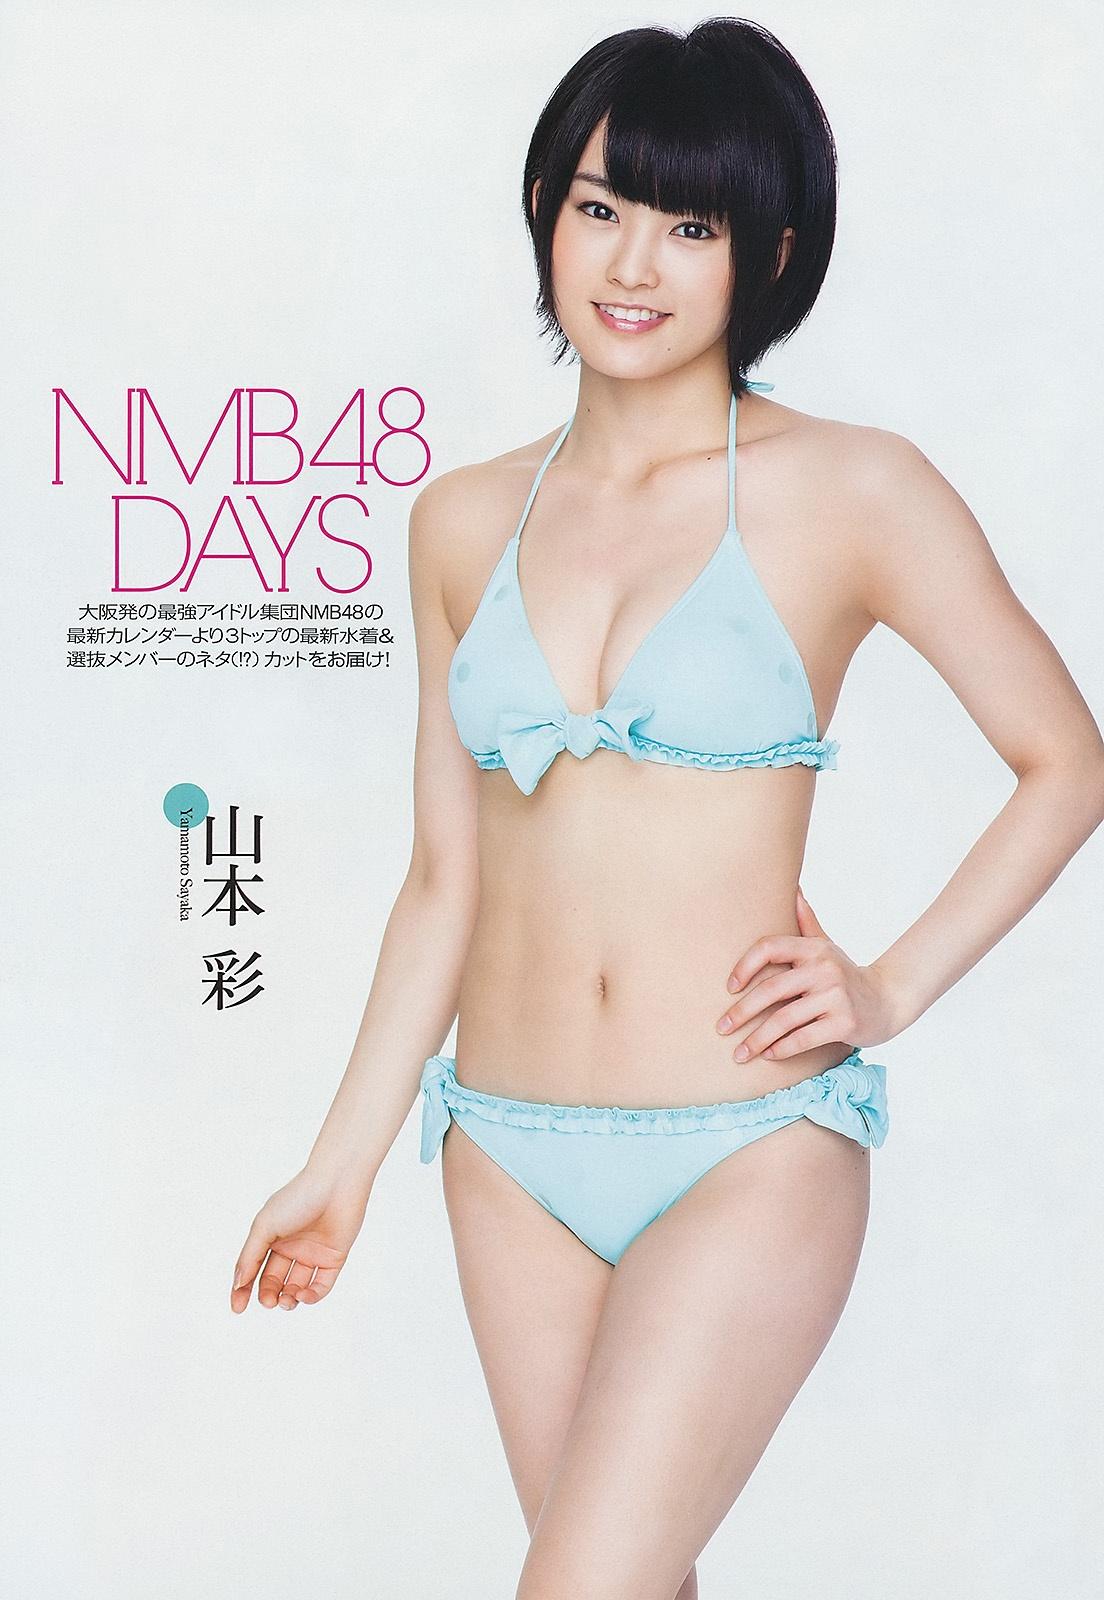 Sayaka Yamamoto Android Iphone Wallpaper 23570 Asiachan